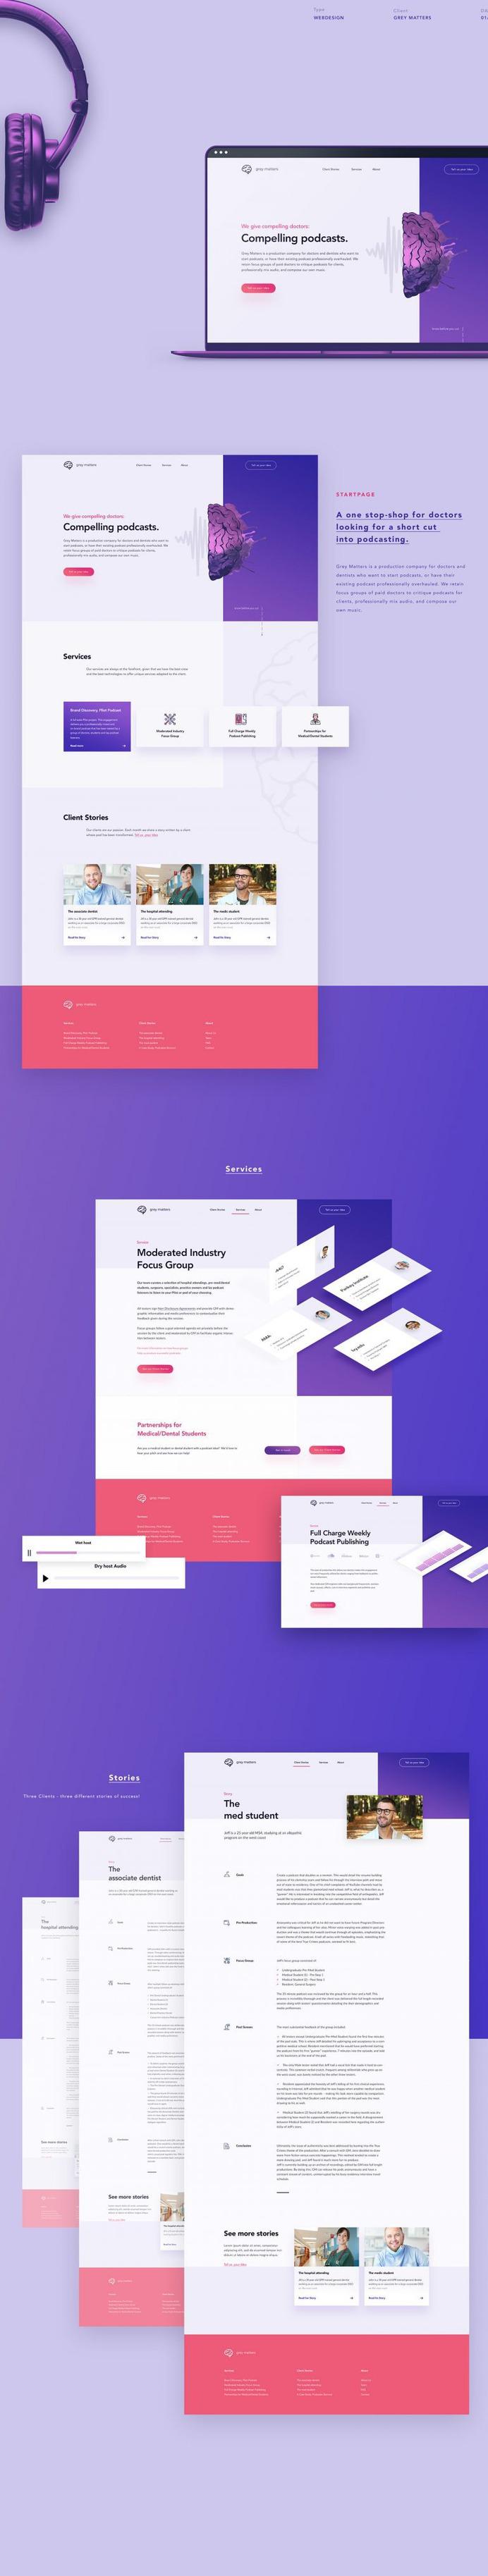 Web Design – Greymatters